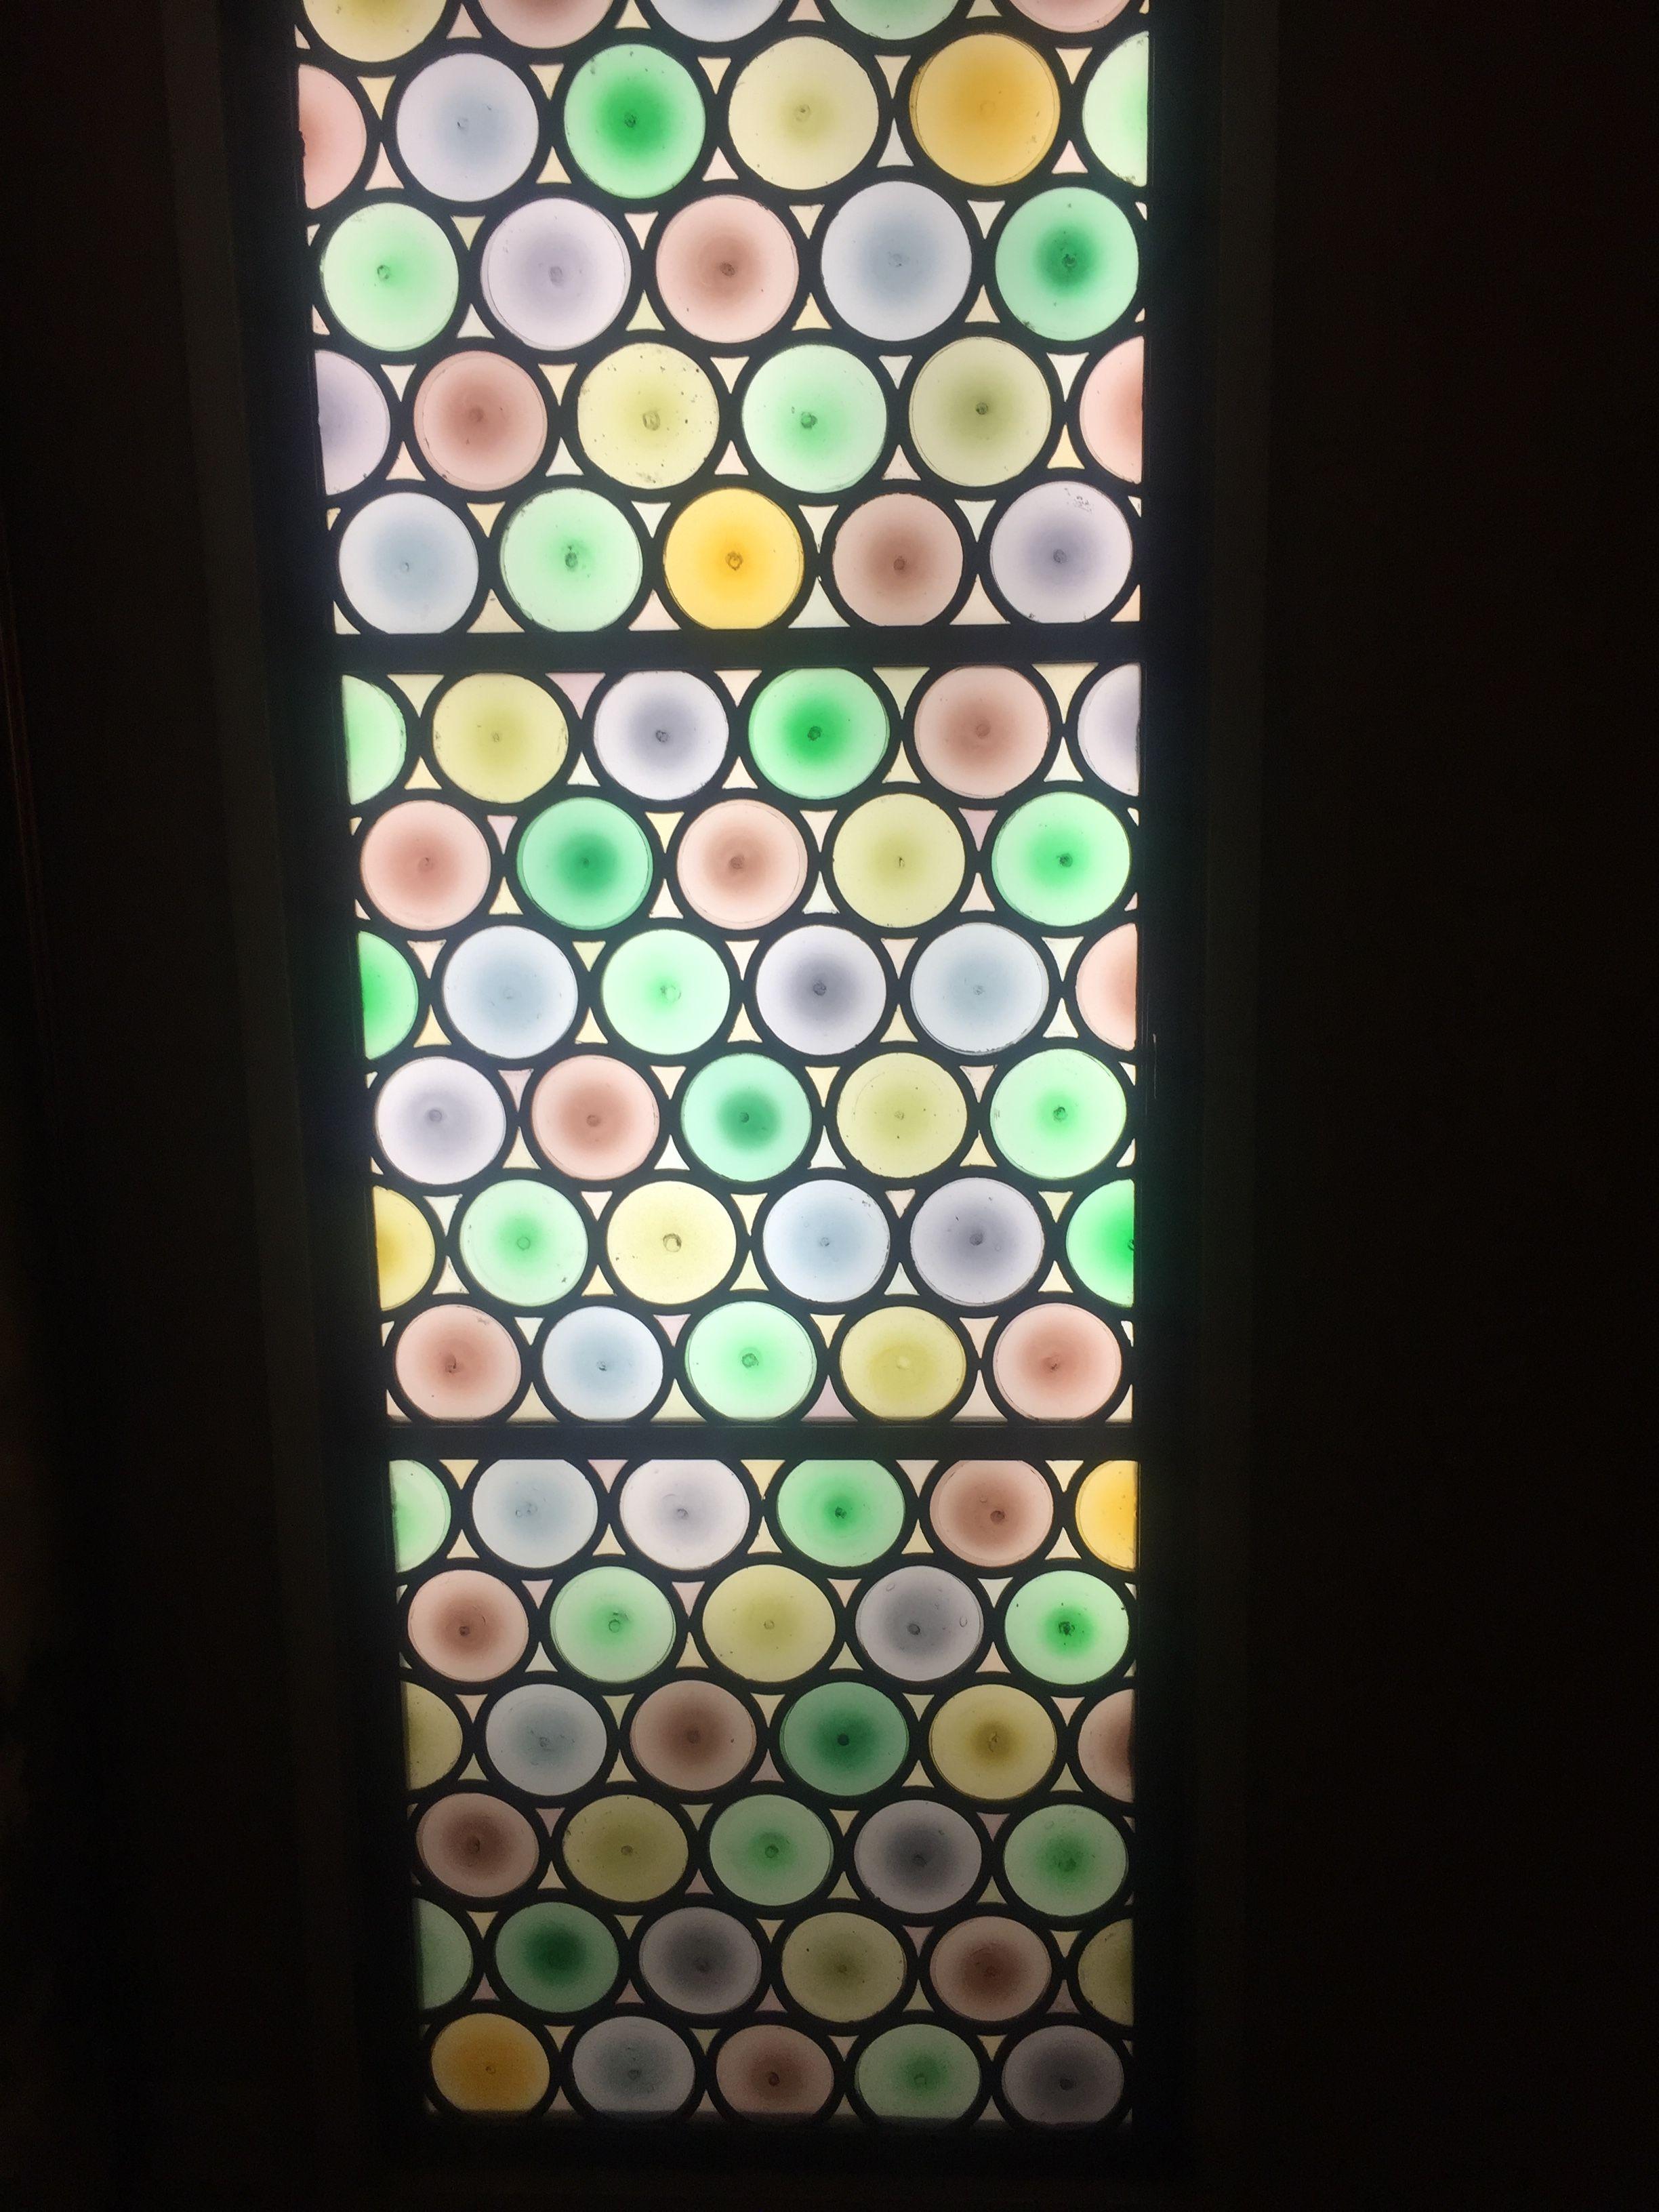 Pin de Adrianna Molina Baranzini en Patterns and color palette